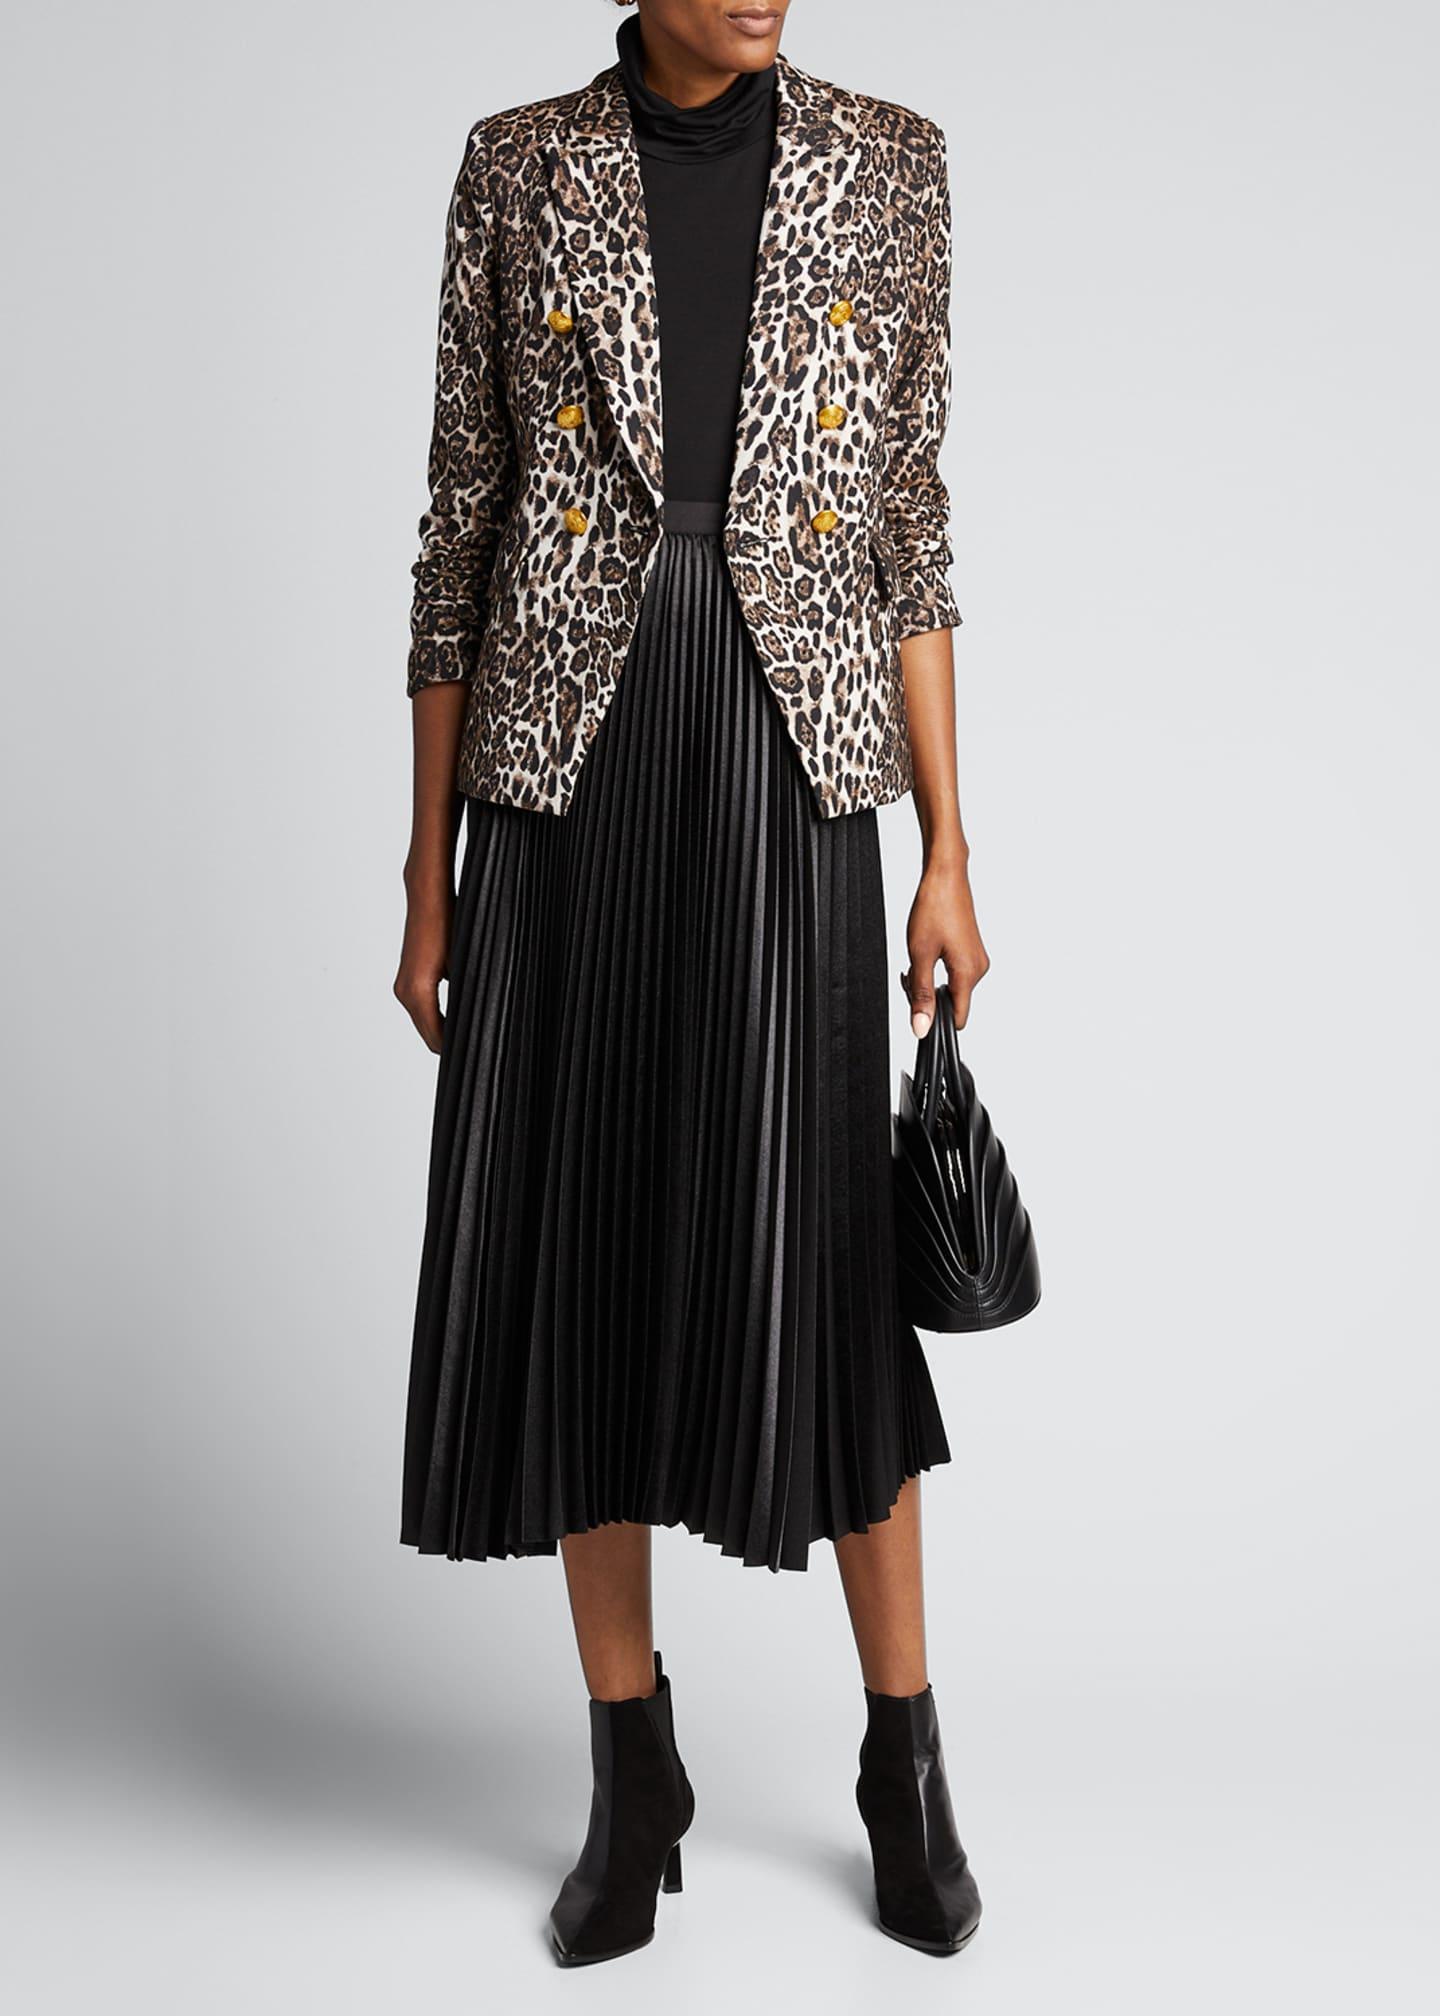 A.L.C. Alton Leopard-Print Jacket